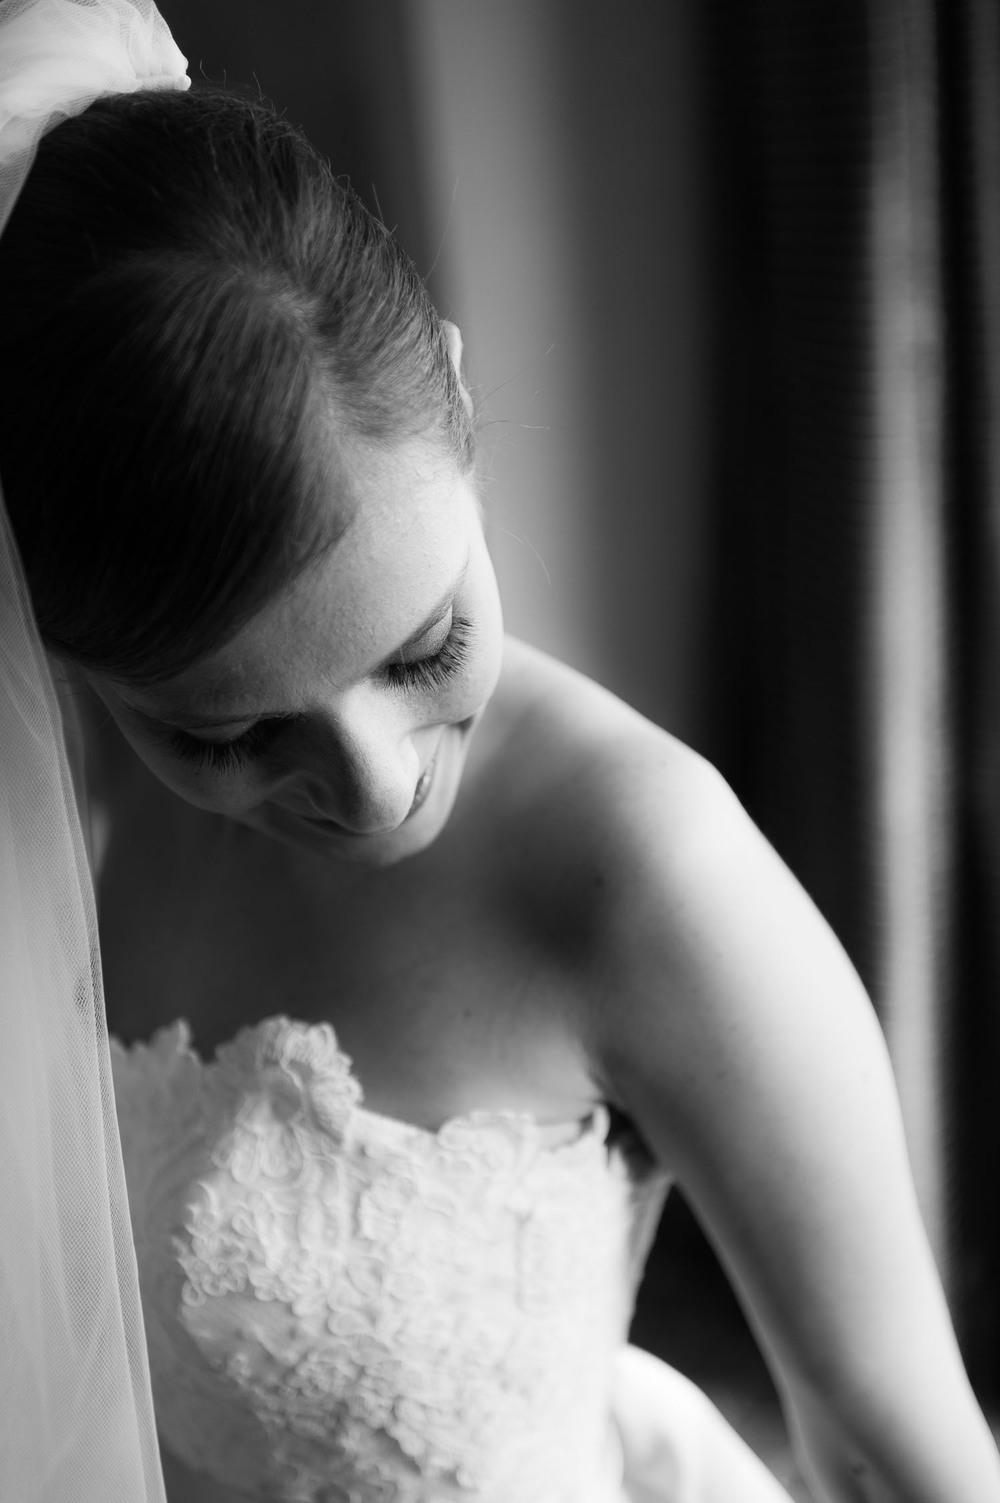 stewart_bertrand_wedding_photography_sp-1014.jpg